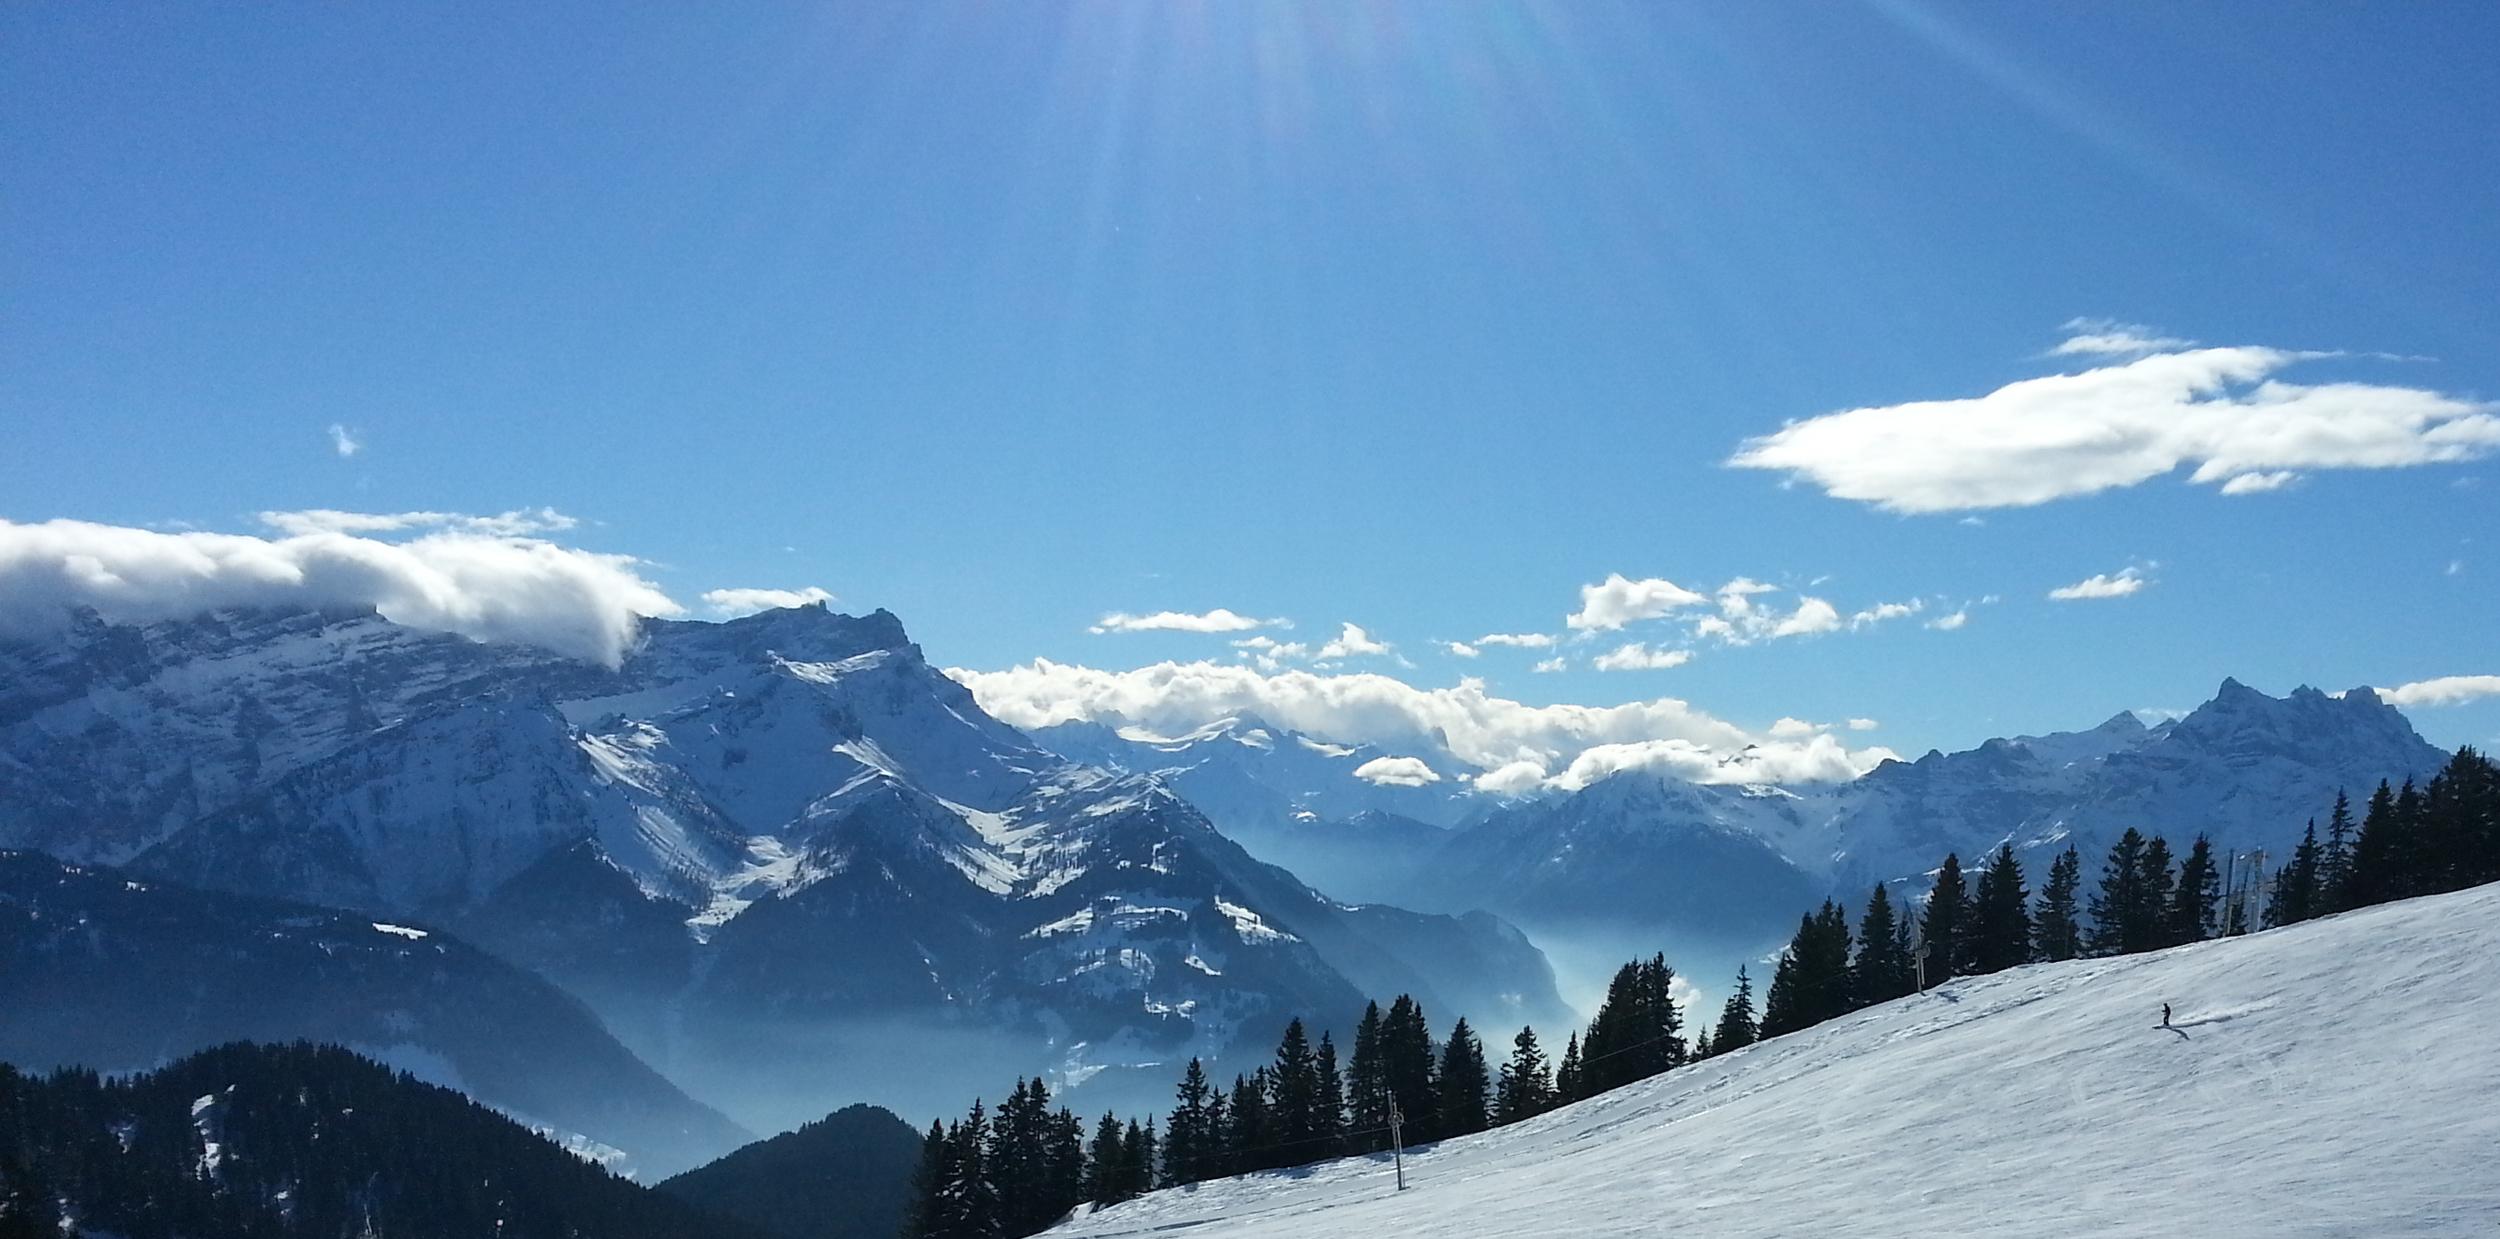 Les Diablerets skier